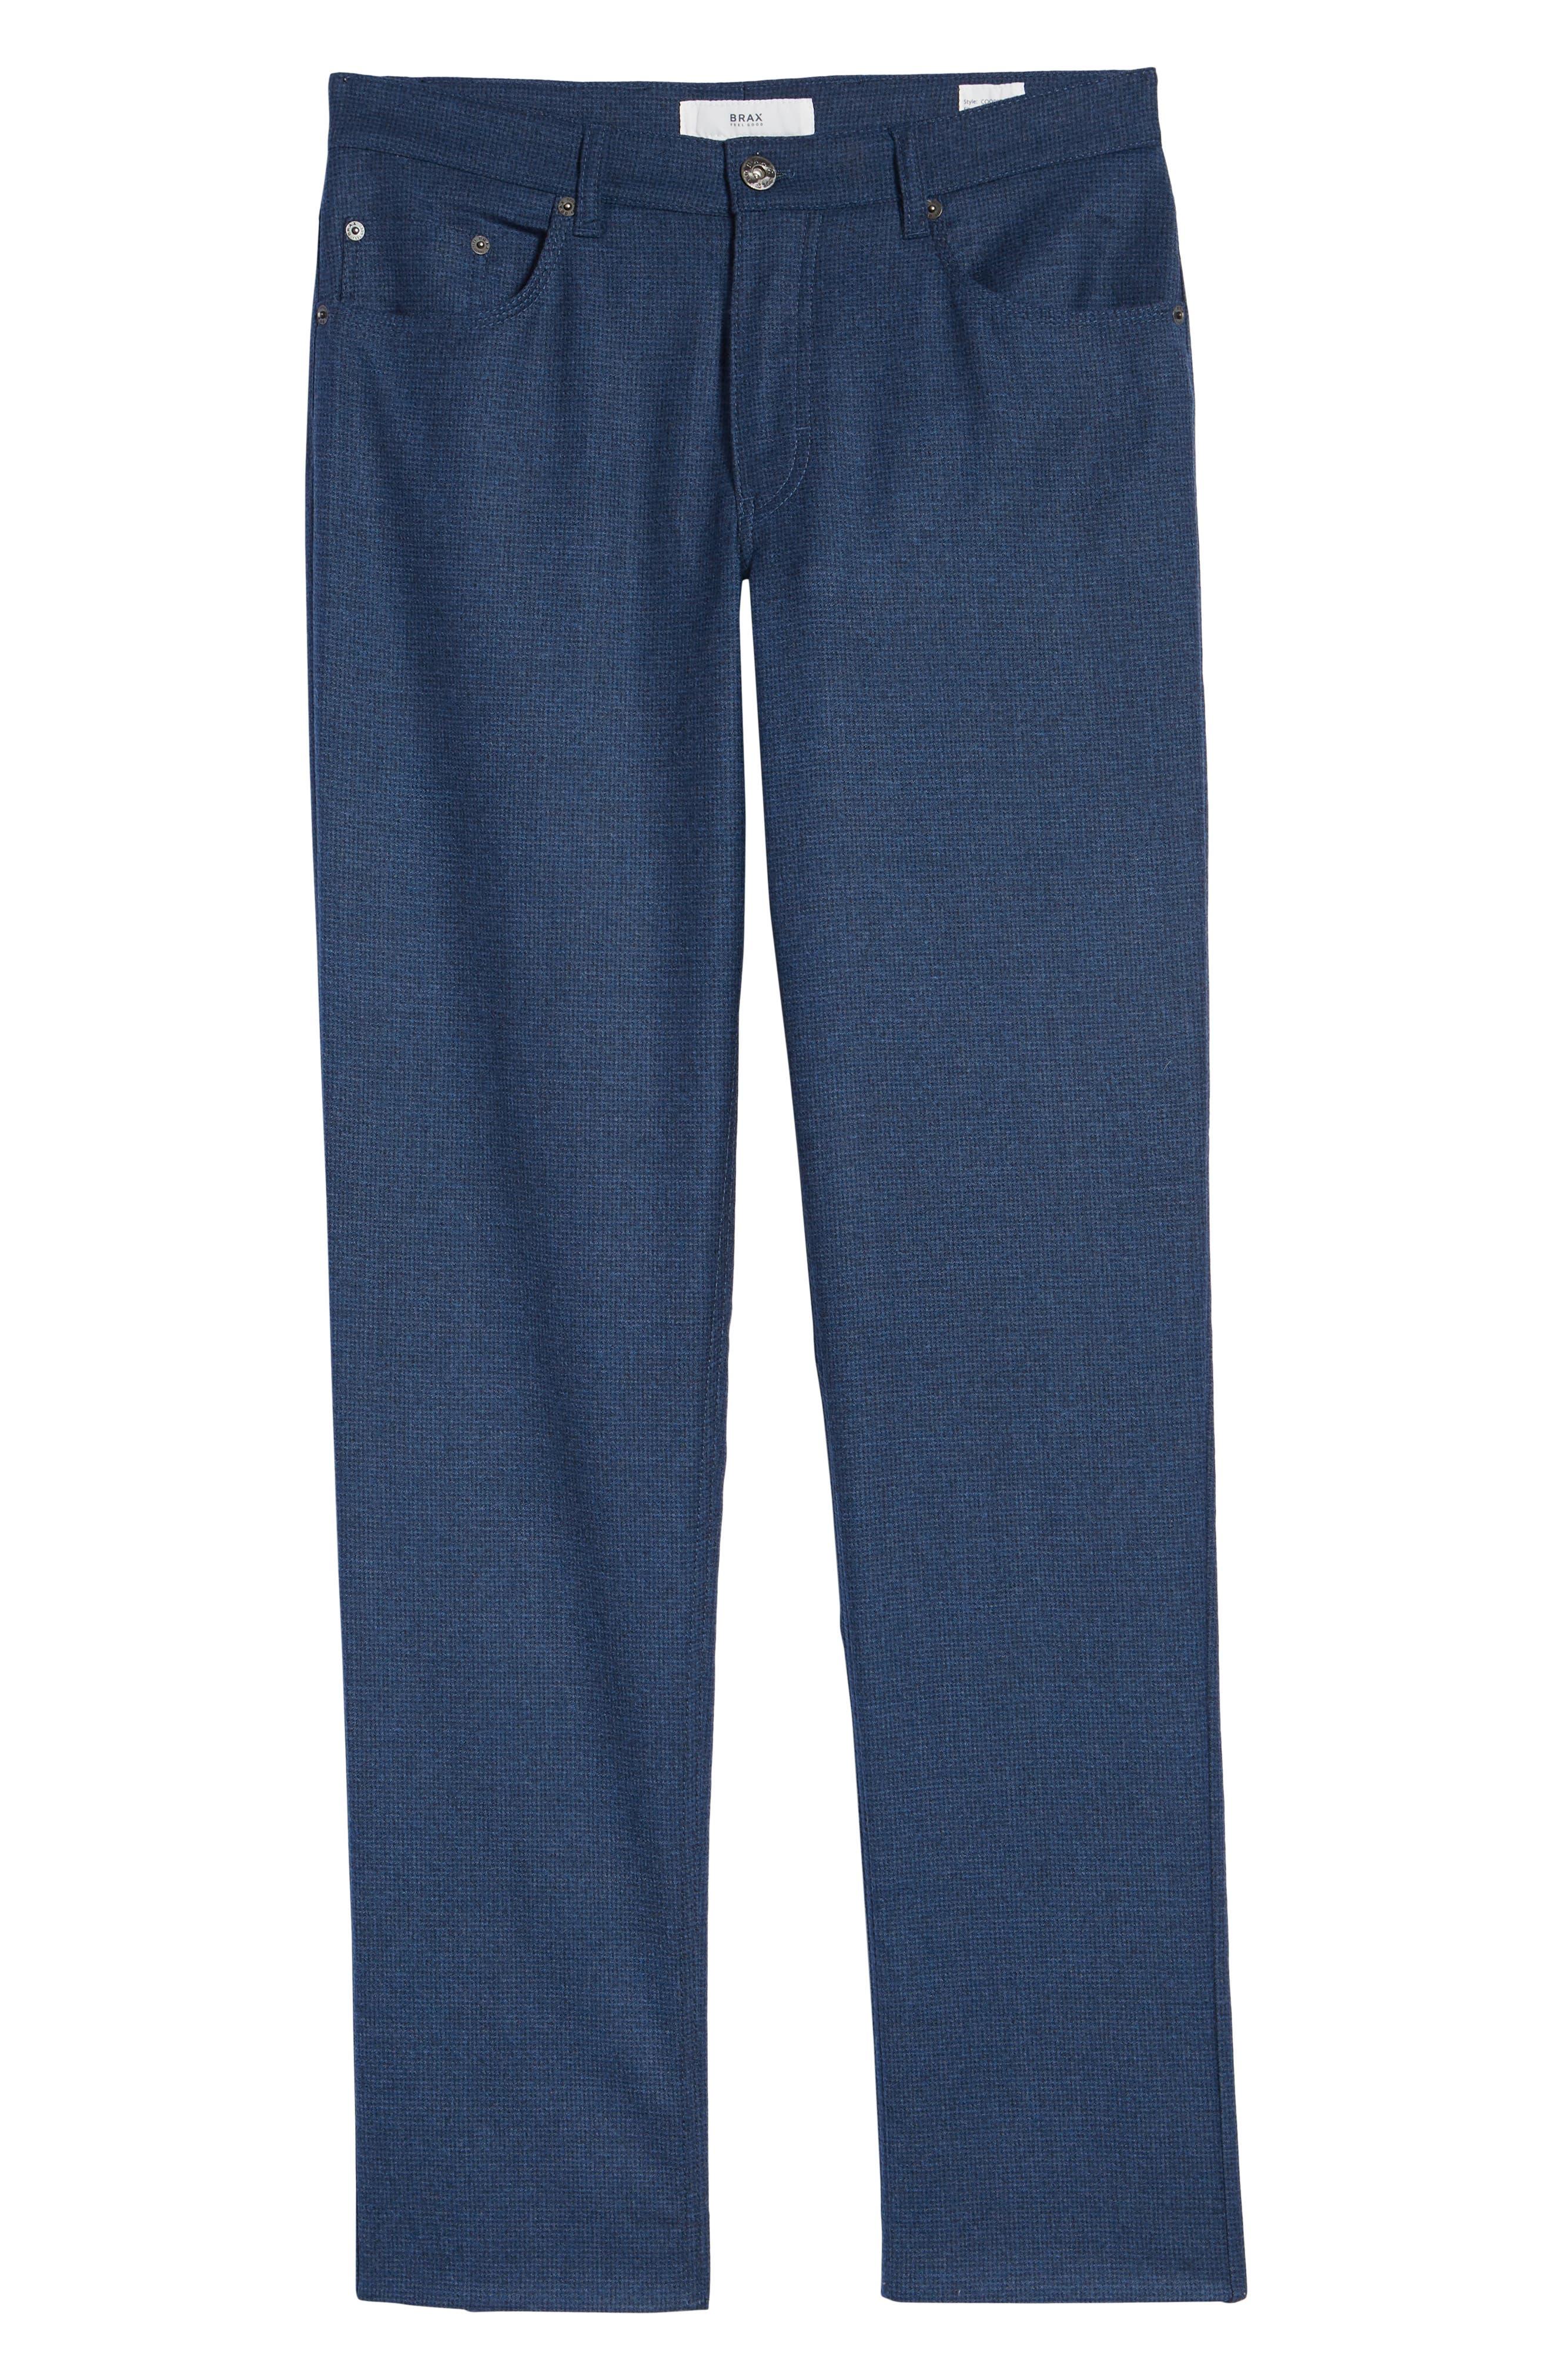 Cadiz Five-Pocket Stretch Wool Trousers,                             Alternate thumbnail 6, color,                             MIDNIGHT